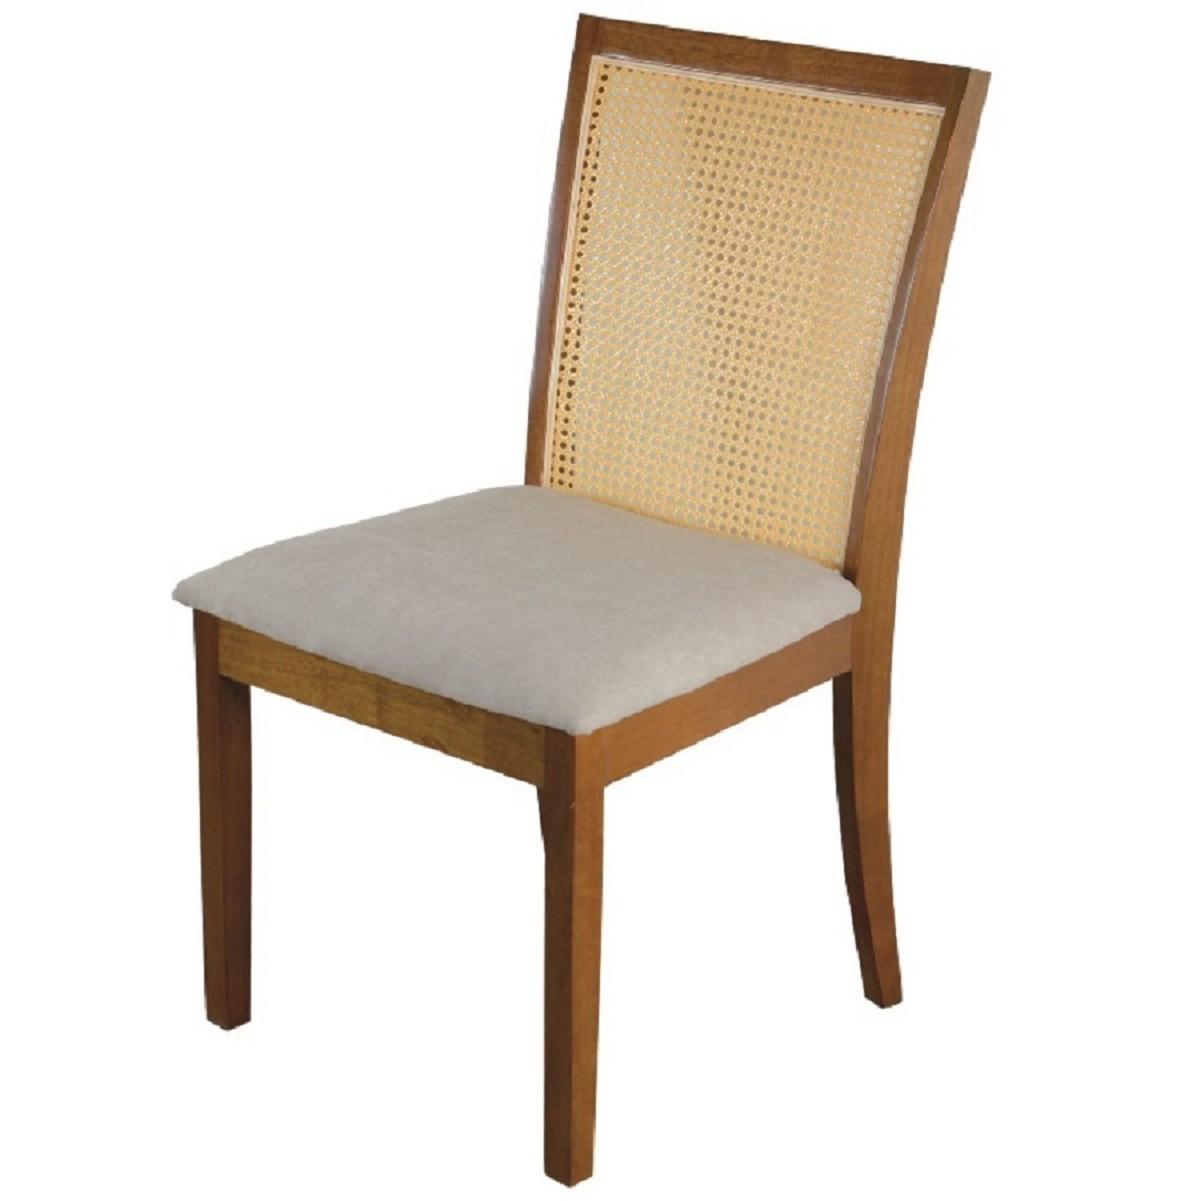 Kit 2 Cadeira Roma Madeira para Mesa Sala Jantar Tradição